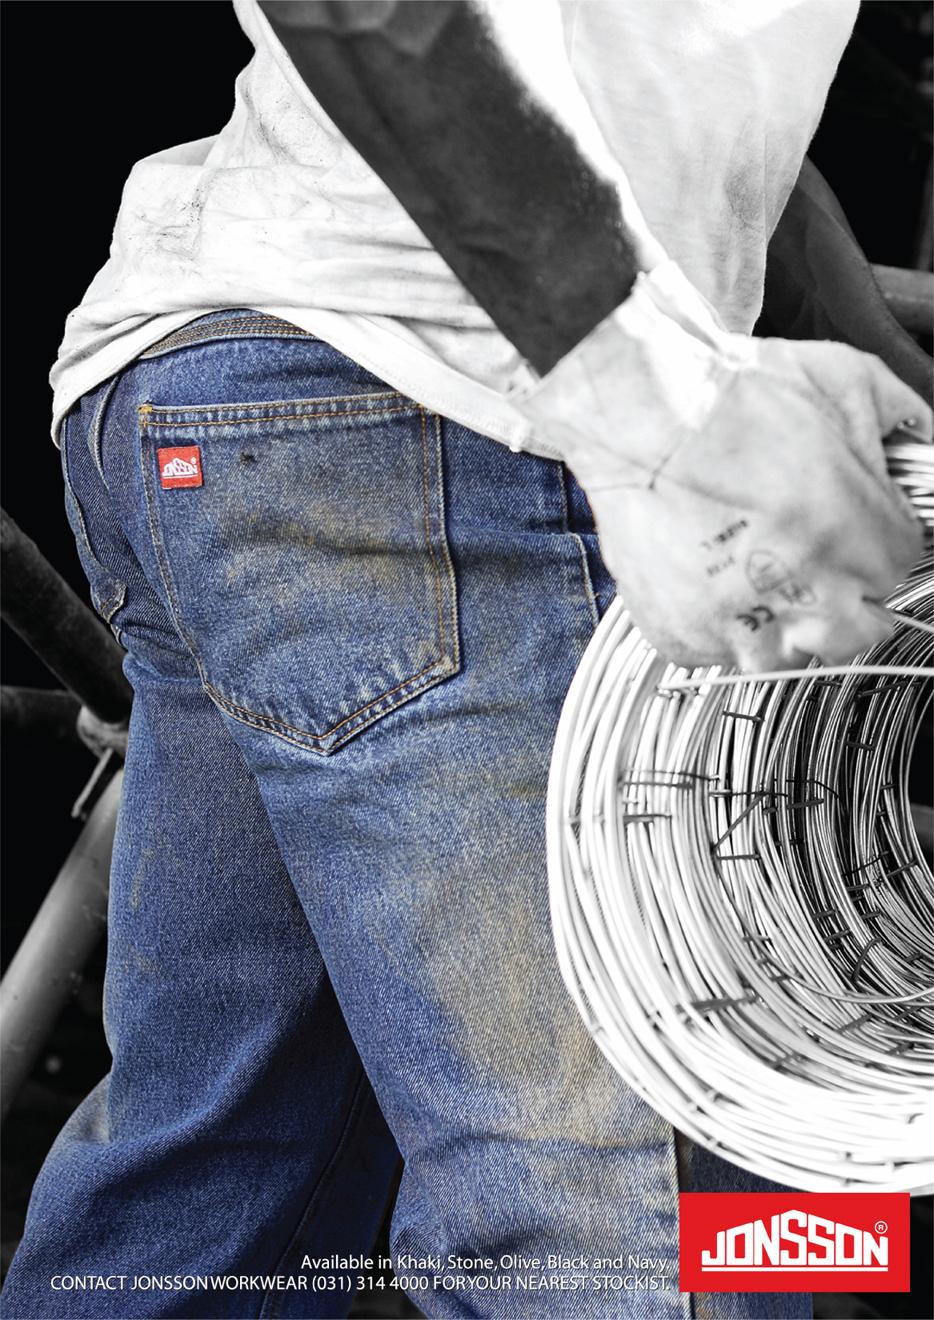 Portfolio image for Jonsson Workwear (campaign 1)